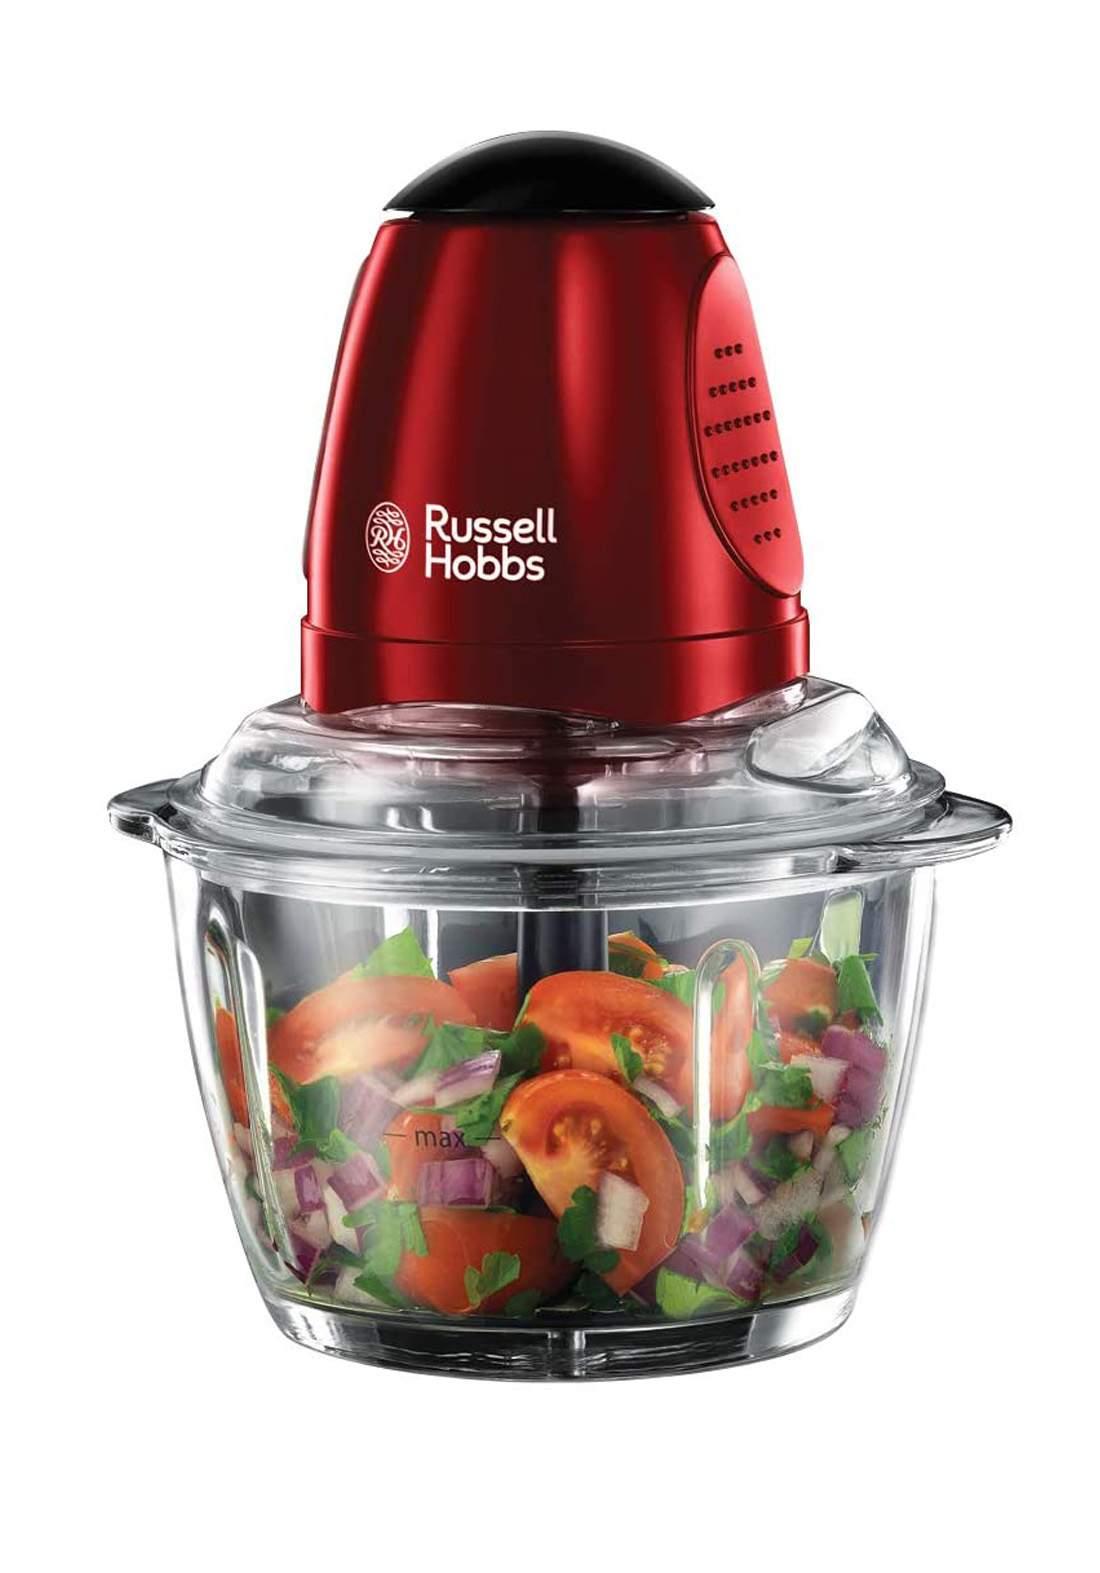 Russell hobbs 20320 Food Processor محضرة طعام